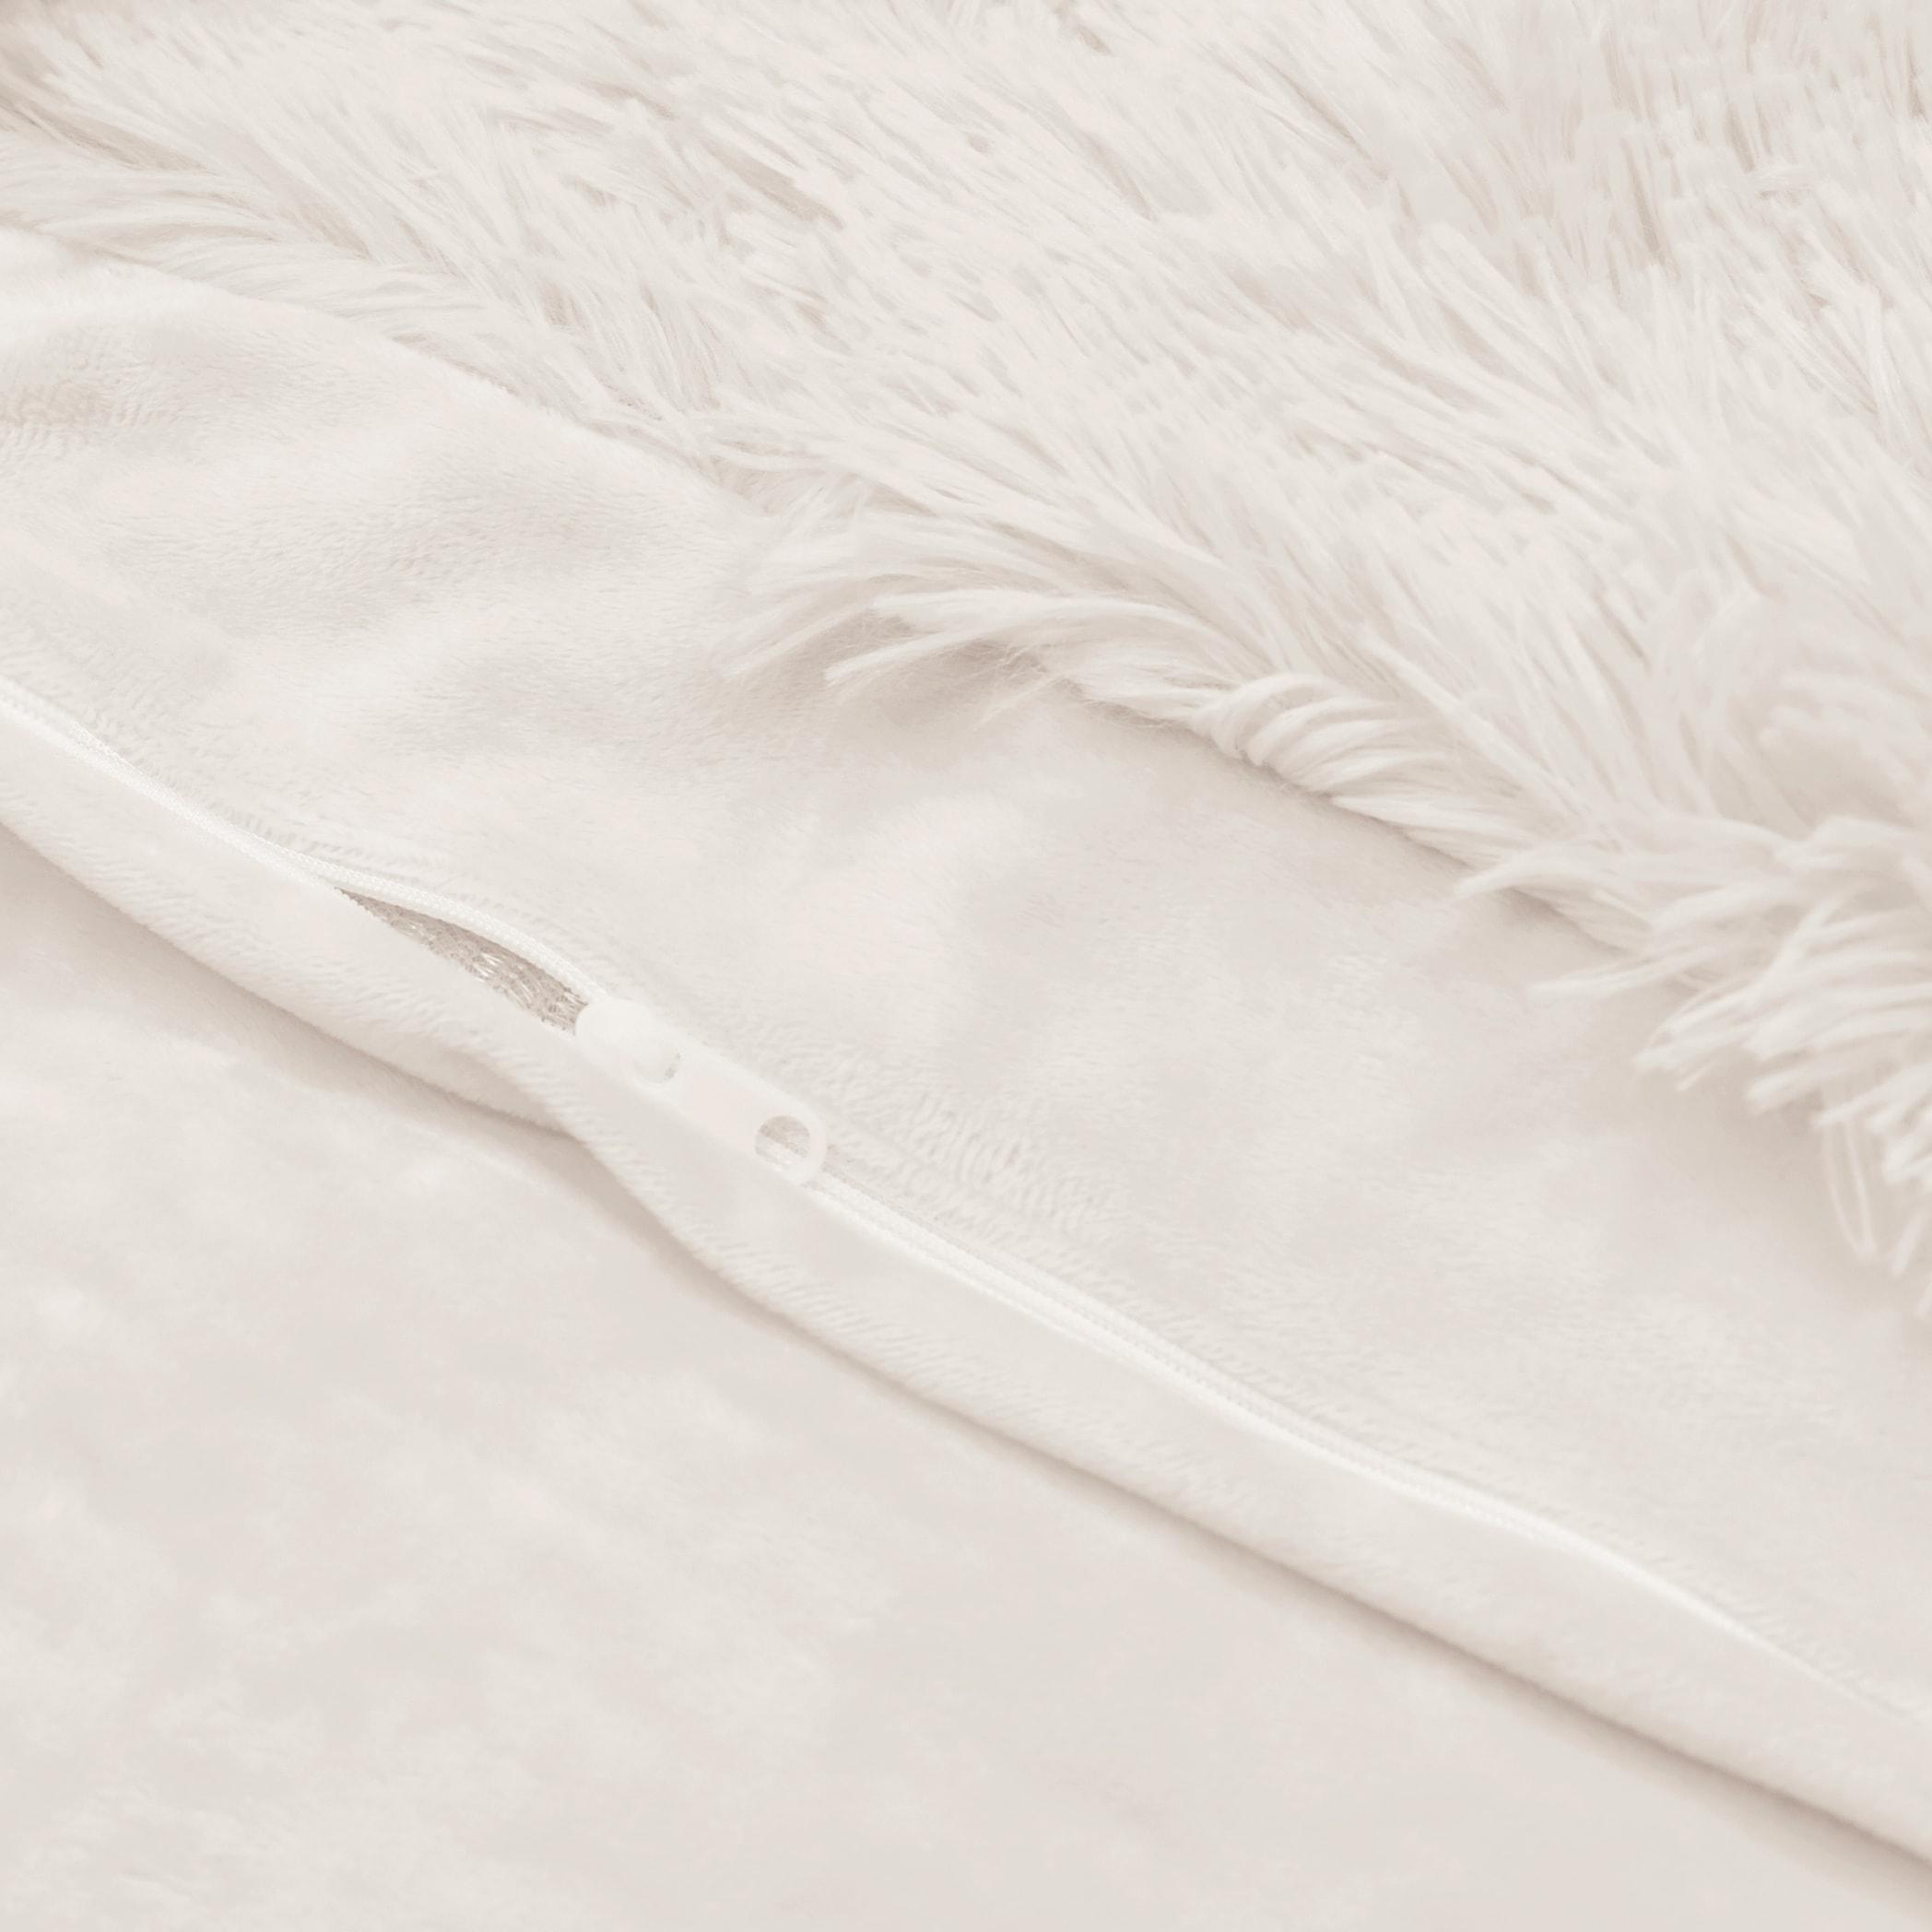 Sweet Jojo Designs White Boho Faux Fur 3pc Queen Size Duvet Comforter Cover Bedding Set Fuzzy Plush Shaggy Fluffy Luxury Teen Overstock 30687135